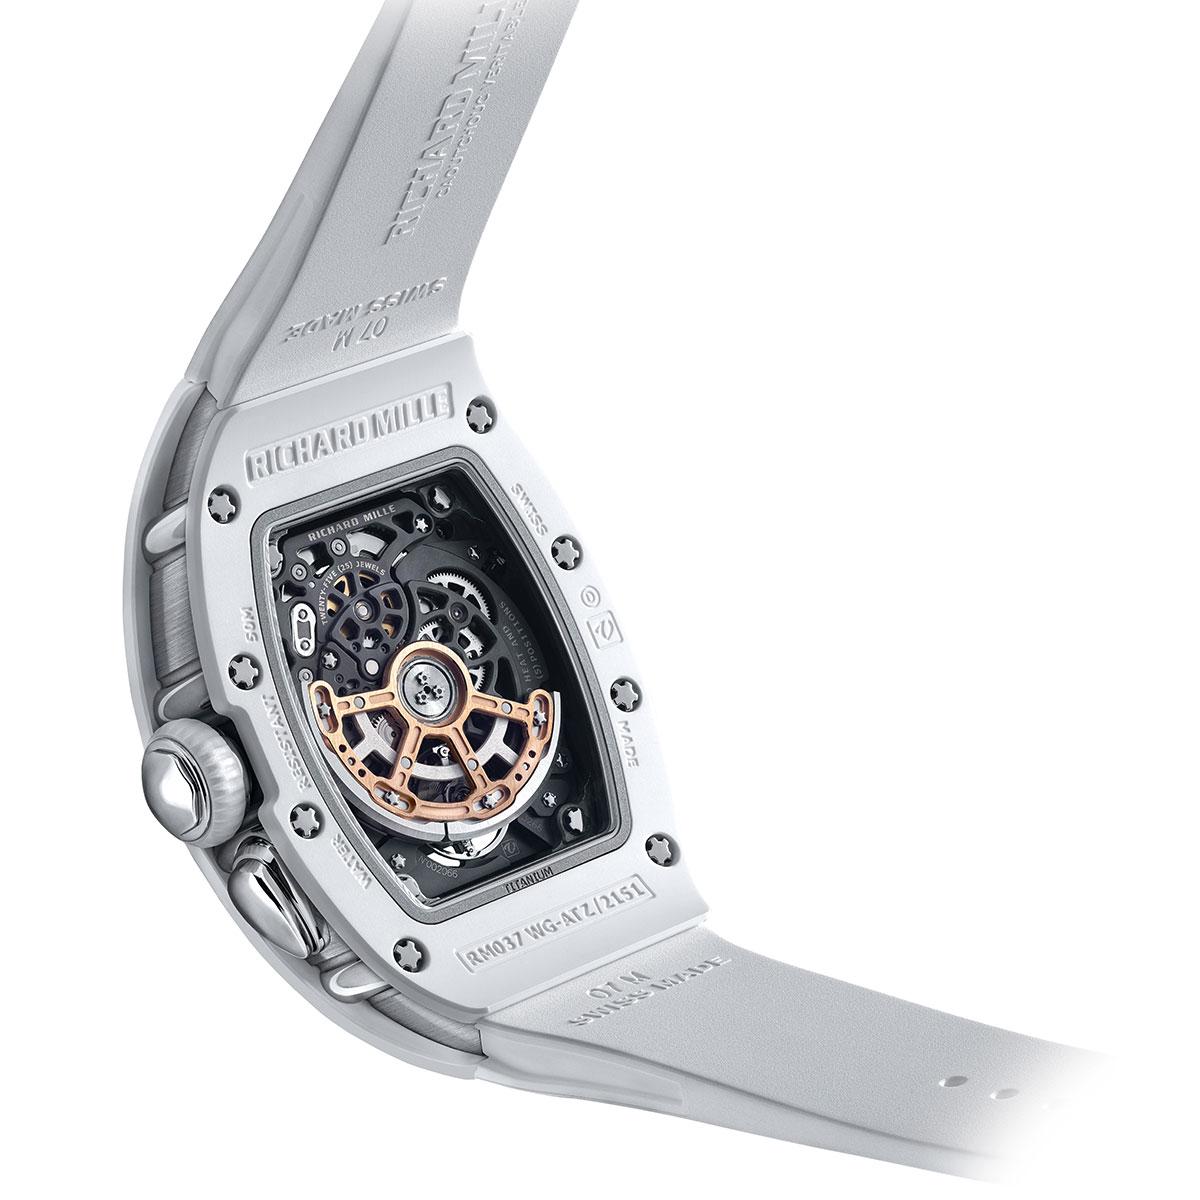 Đồng hồ Richard Mille RM 037 White Ceramic Automatic - 3